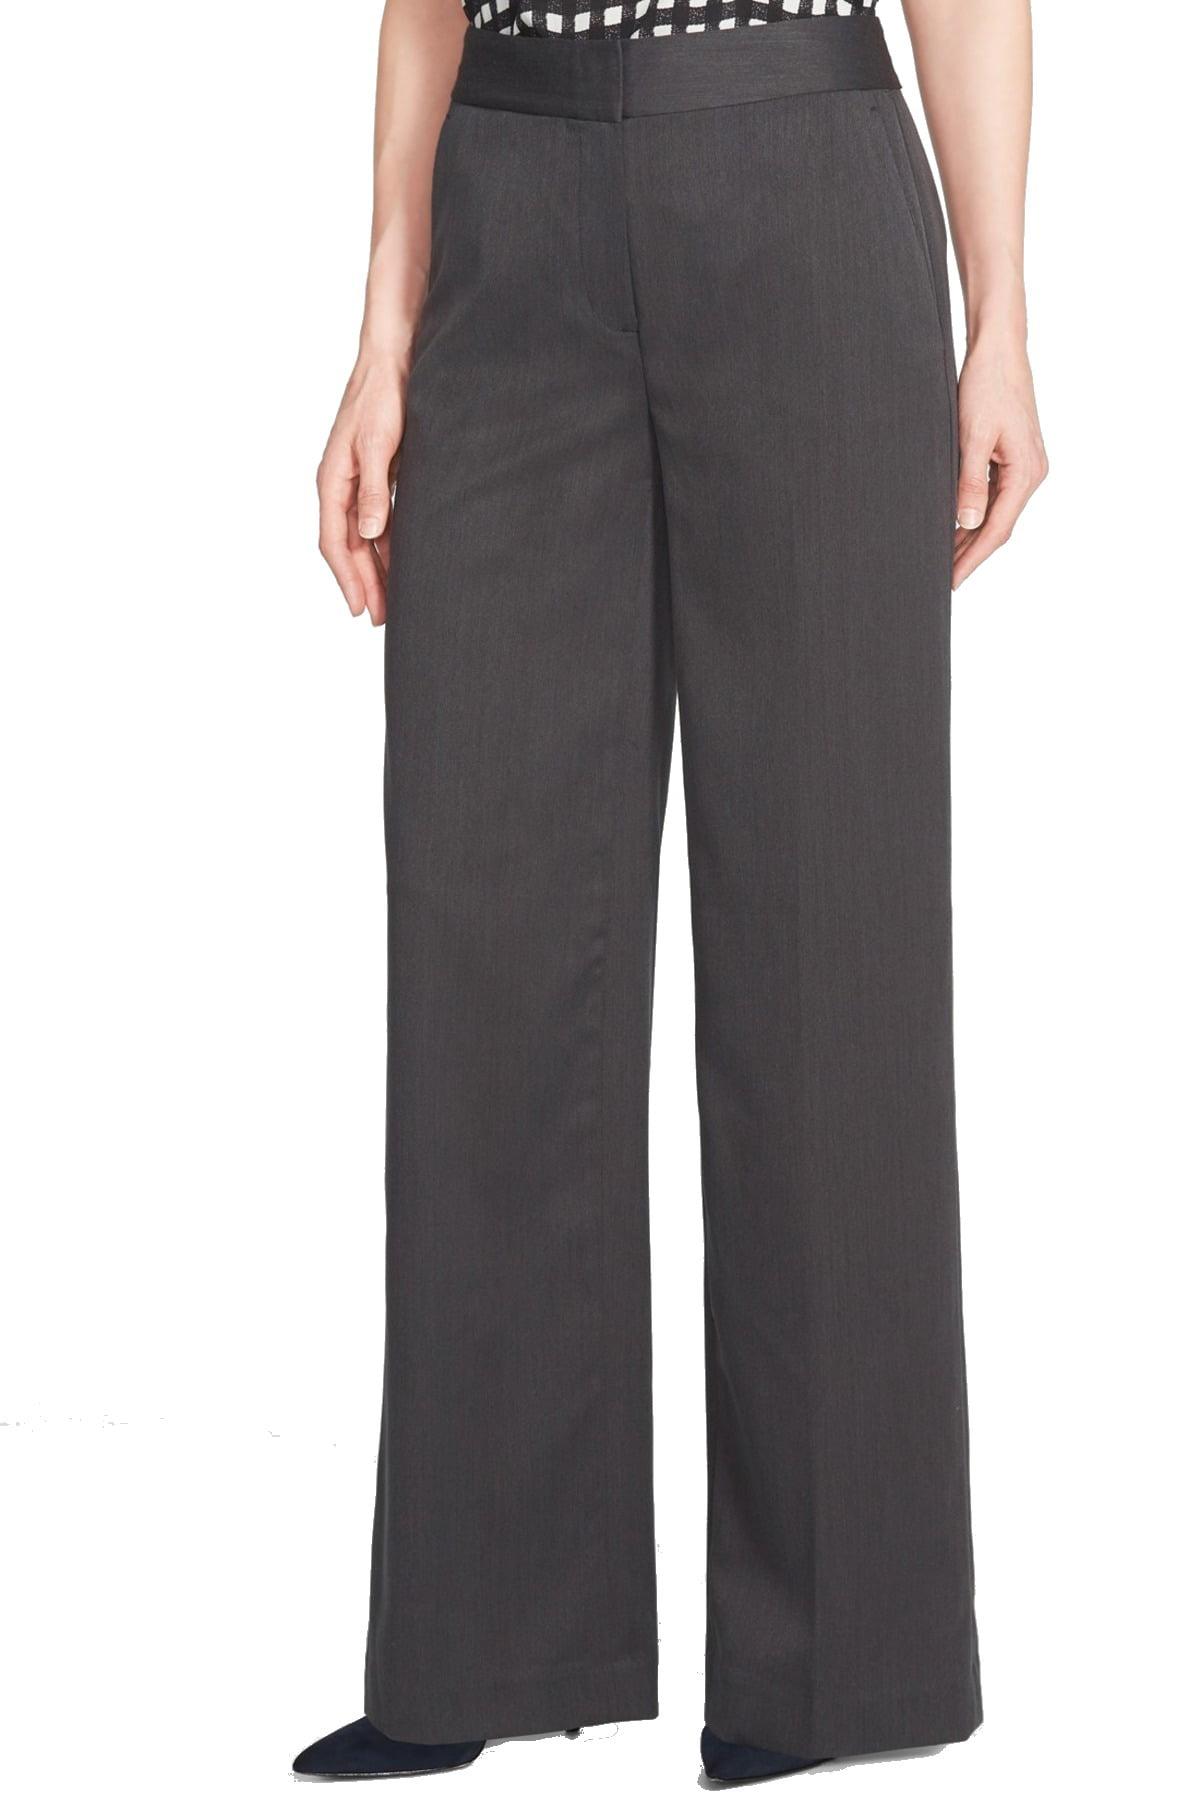 Chelsea28 Charcoal Women's Wide-Leg Dress Pants